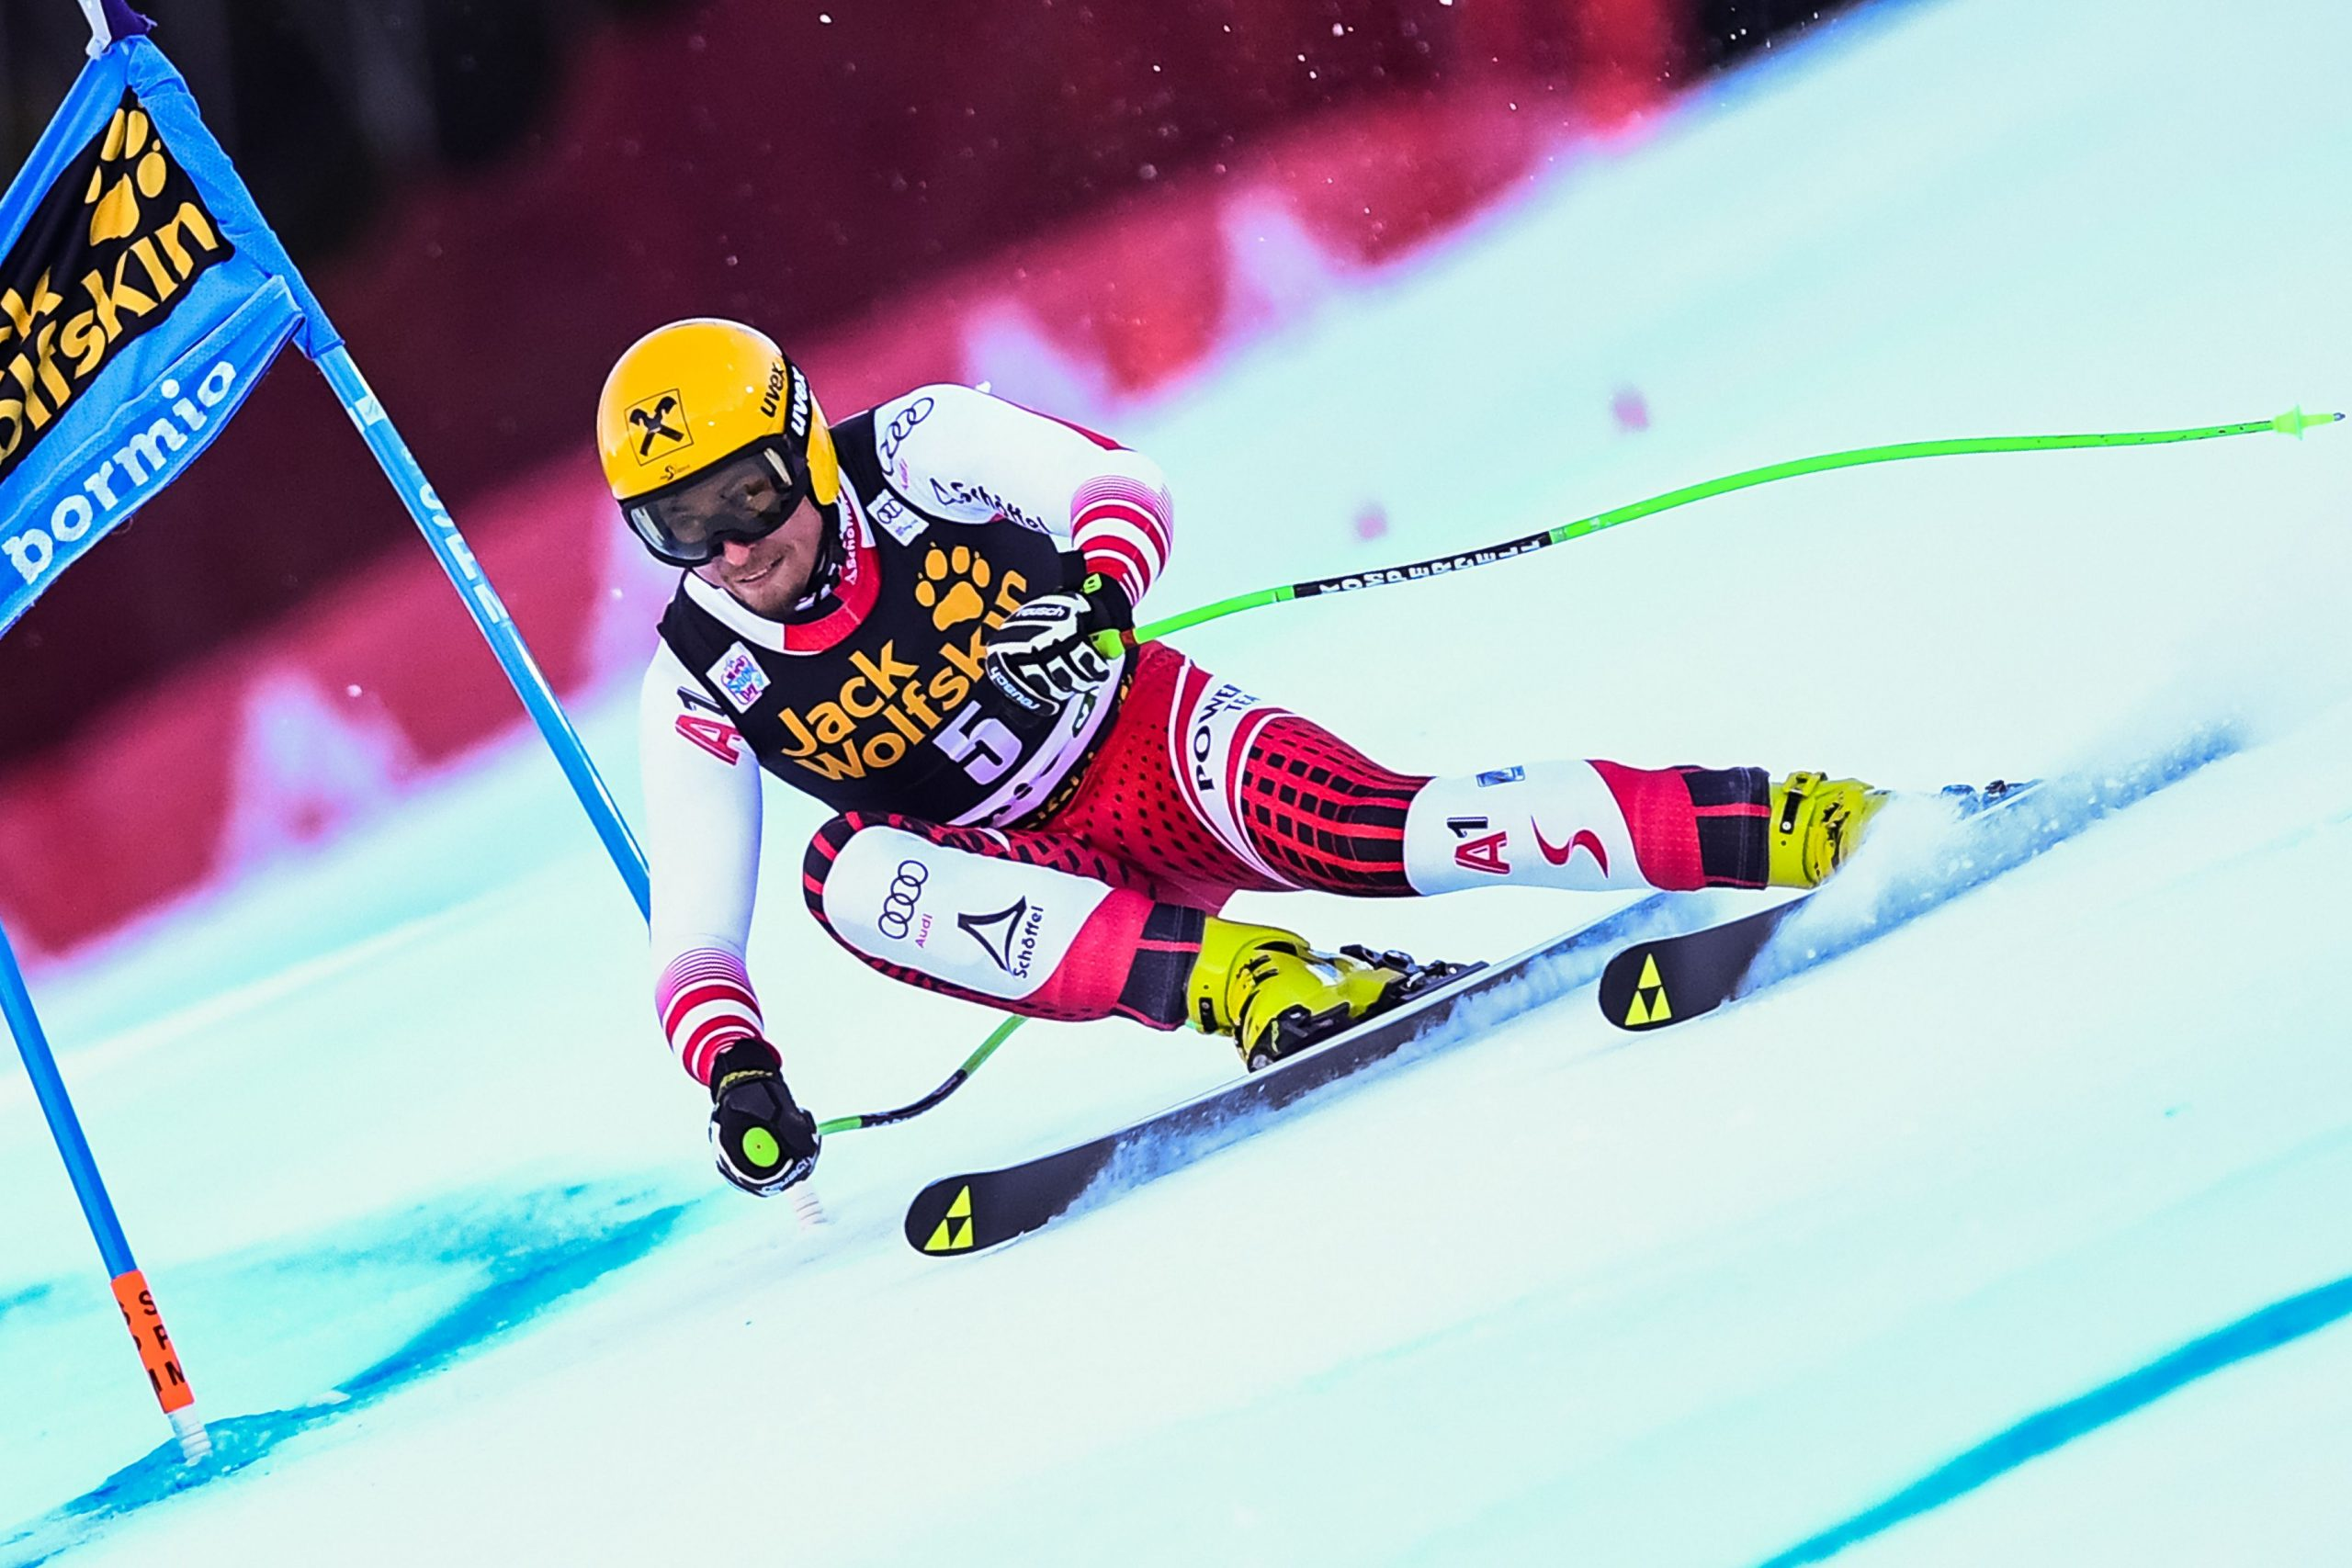 HD Austria überträgt fünf Ski-Alpin-Highlights in UHD auf Eurosport 4K